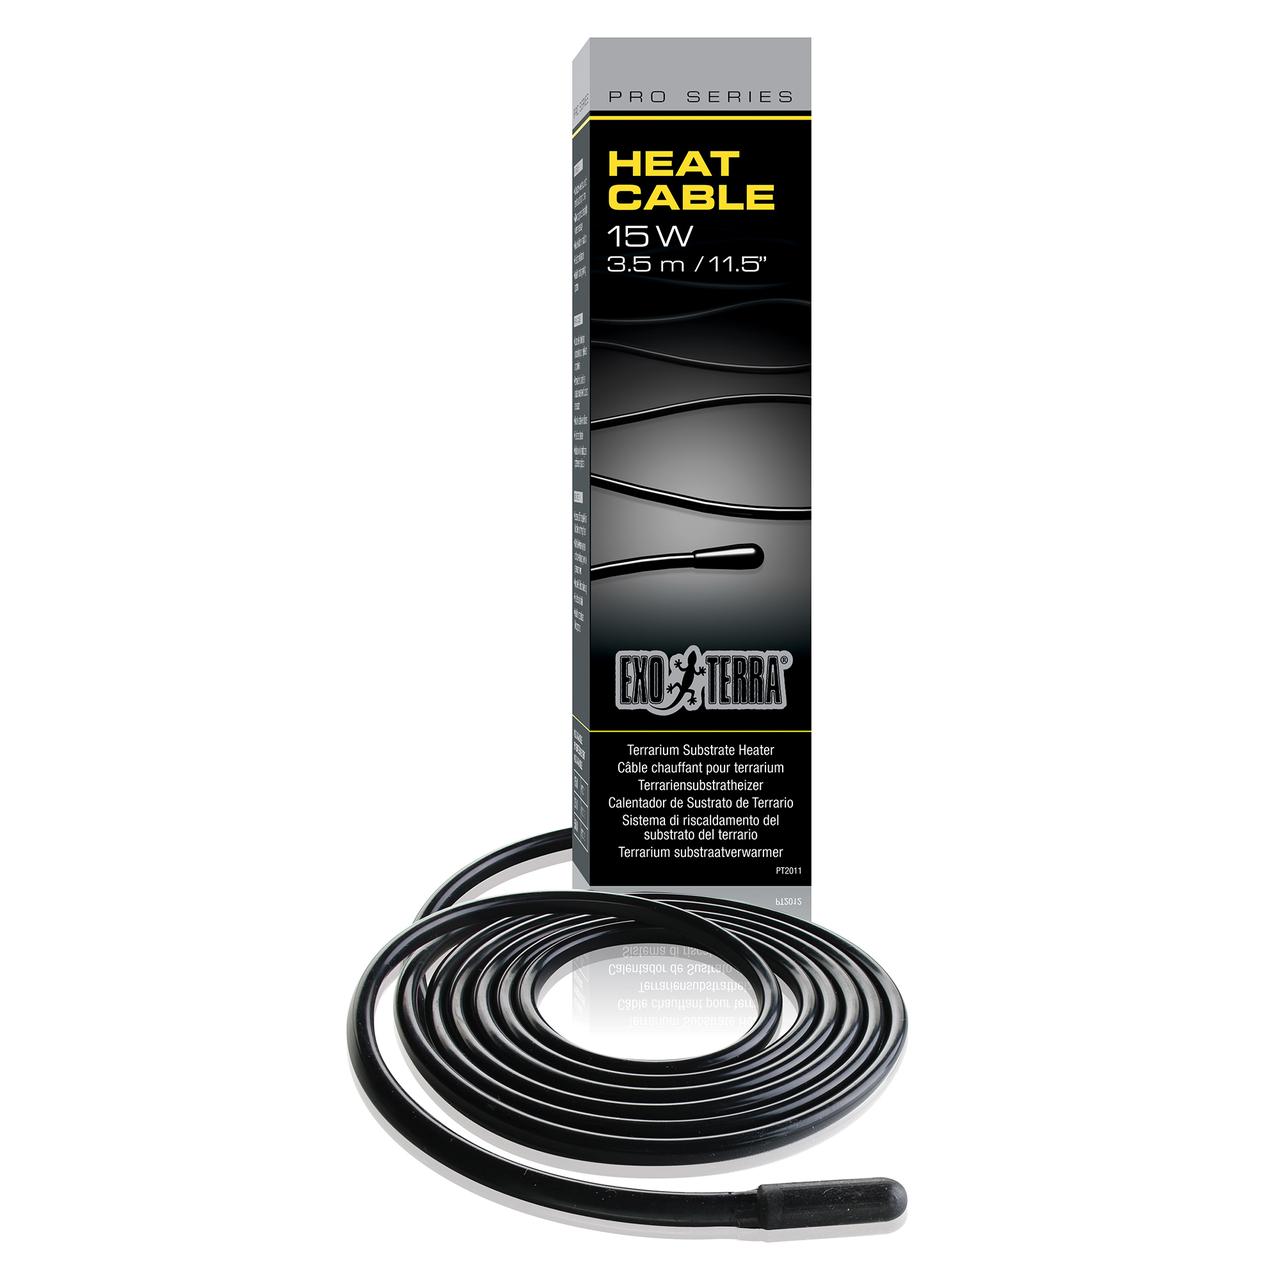 Обогреватель Exo Terra «Heat Cable» Горячий шнур 15 W, 3,50 м